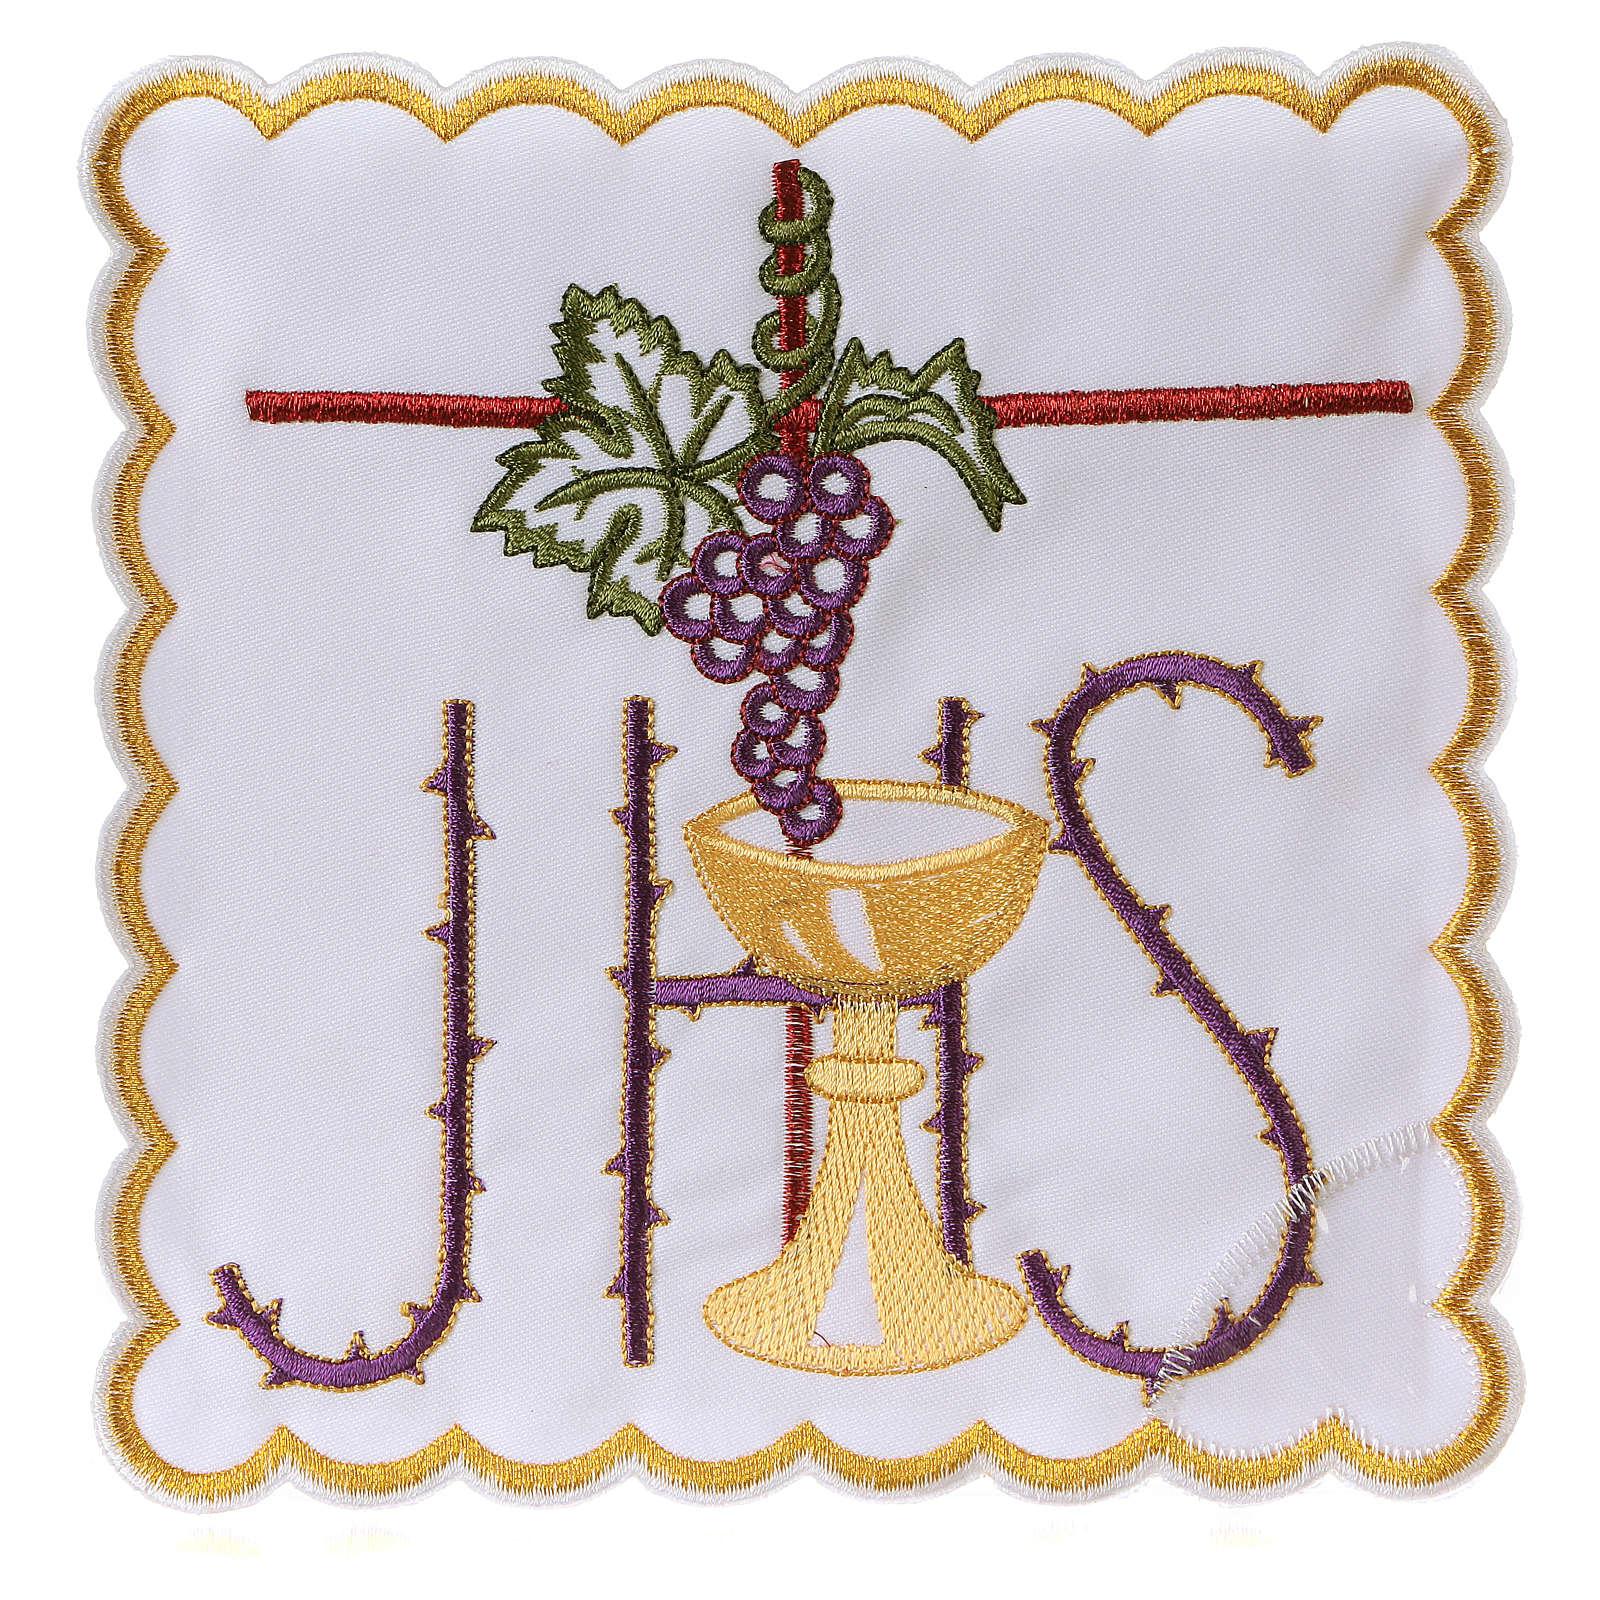 Servicio de altar algodón cáliz hoja uva símbolo JHS espinado 4